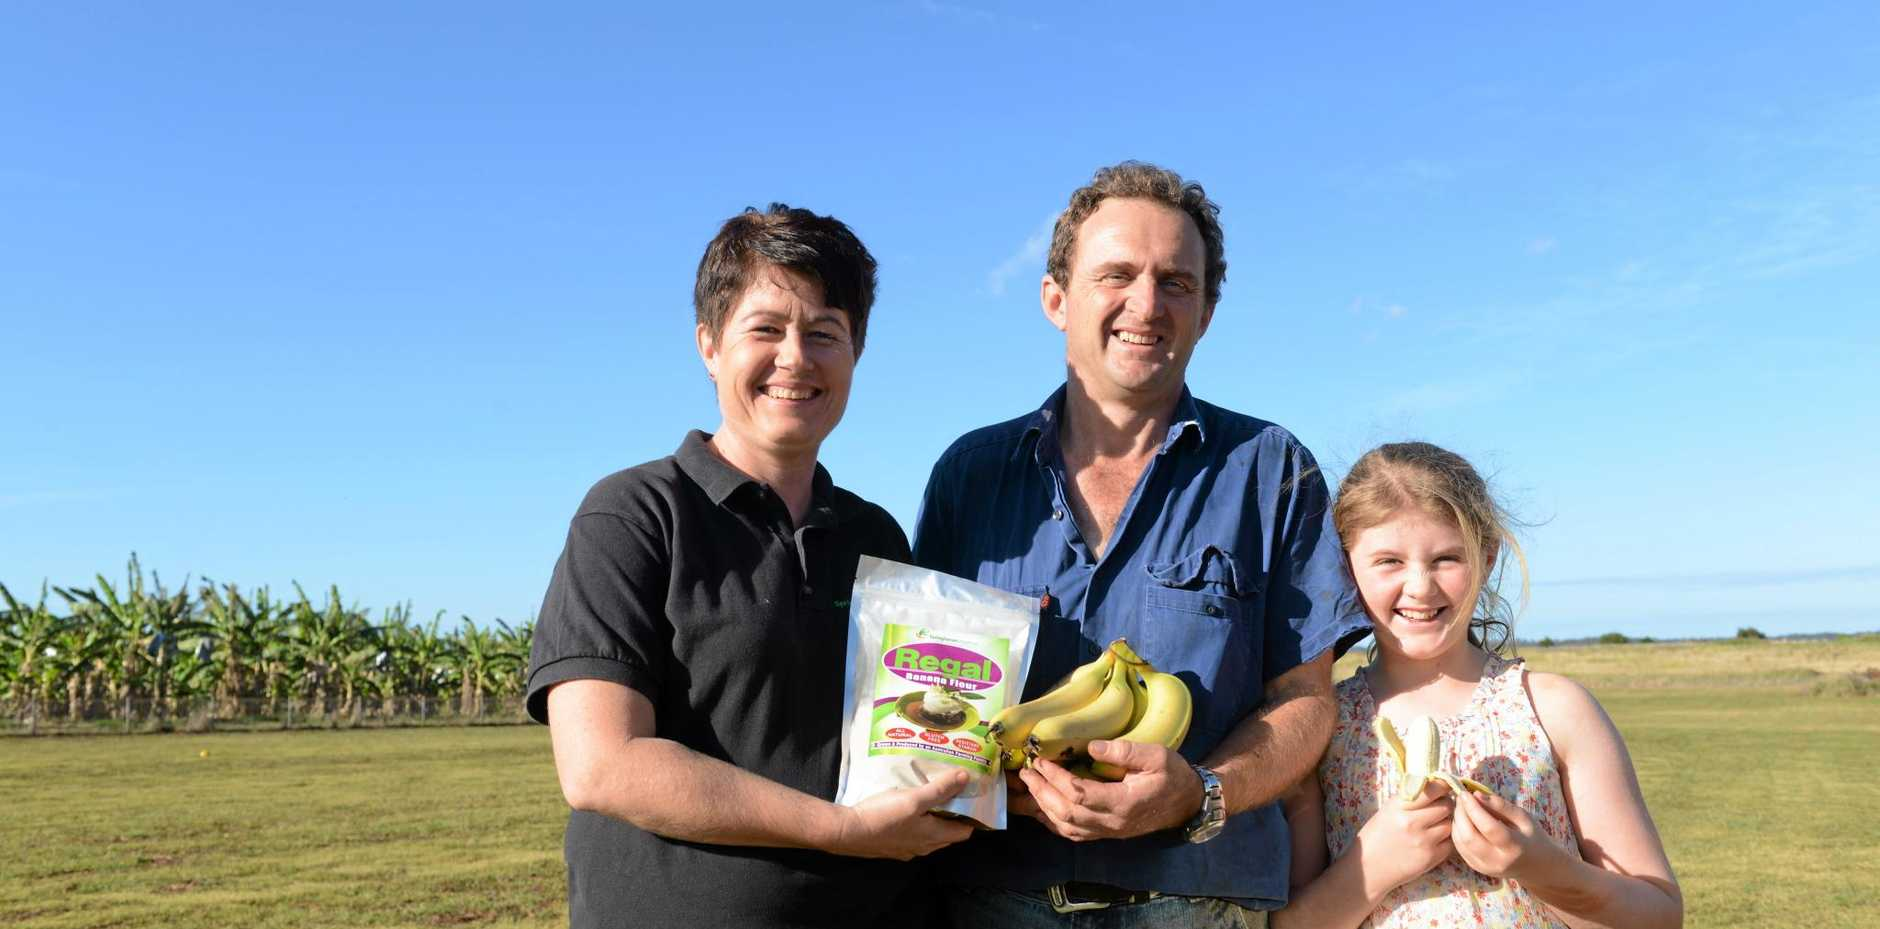 PLATE TO PADDOCK: Jacinta, Gavin and Ava Jowlettt at their farm, Springhaven Meadows.